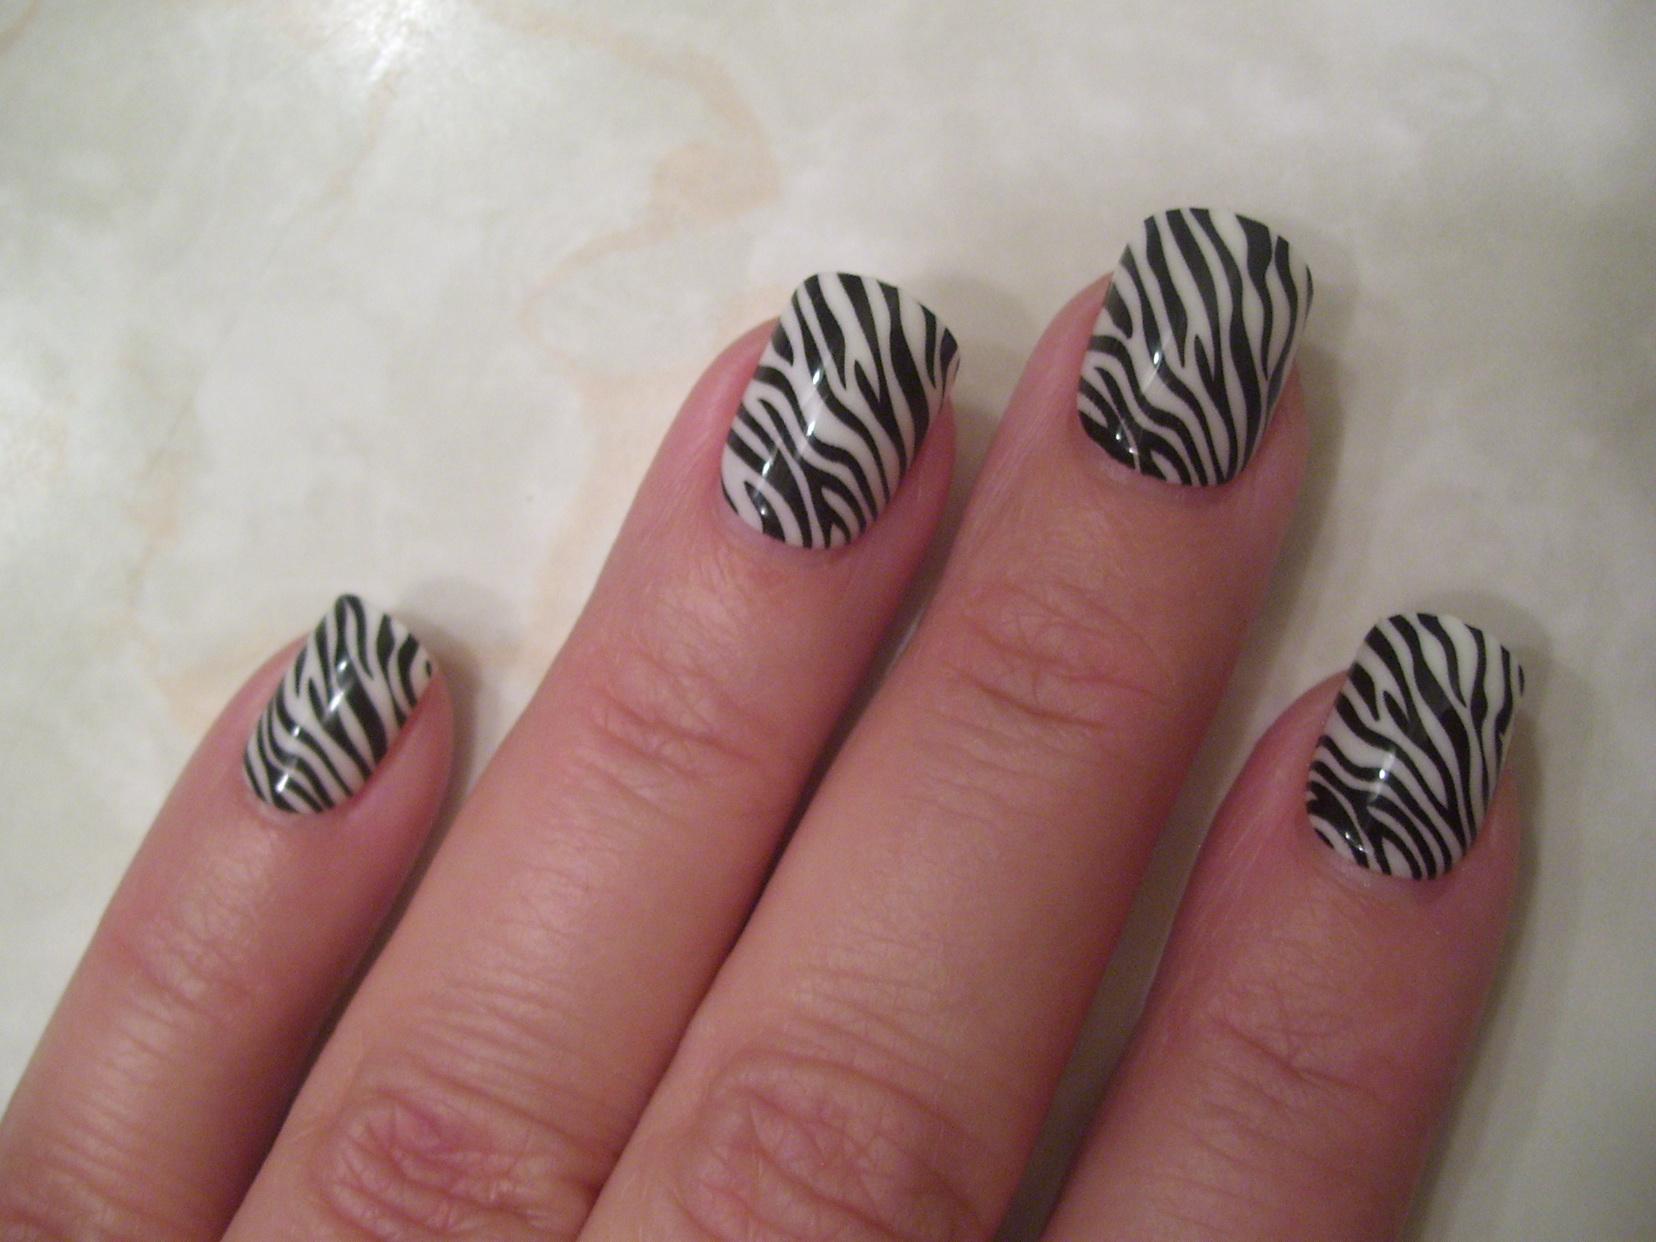 Broadway Nails Impress Accent Press On Manicure Sets   Splendid ...